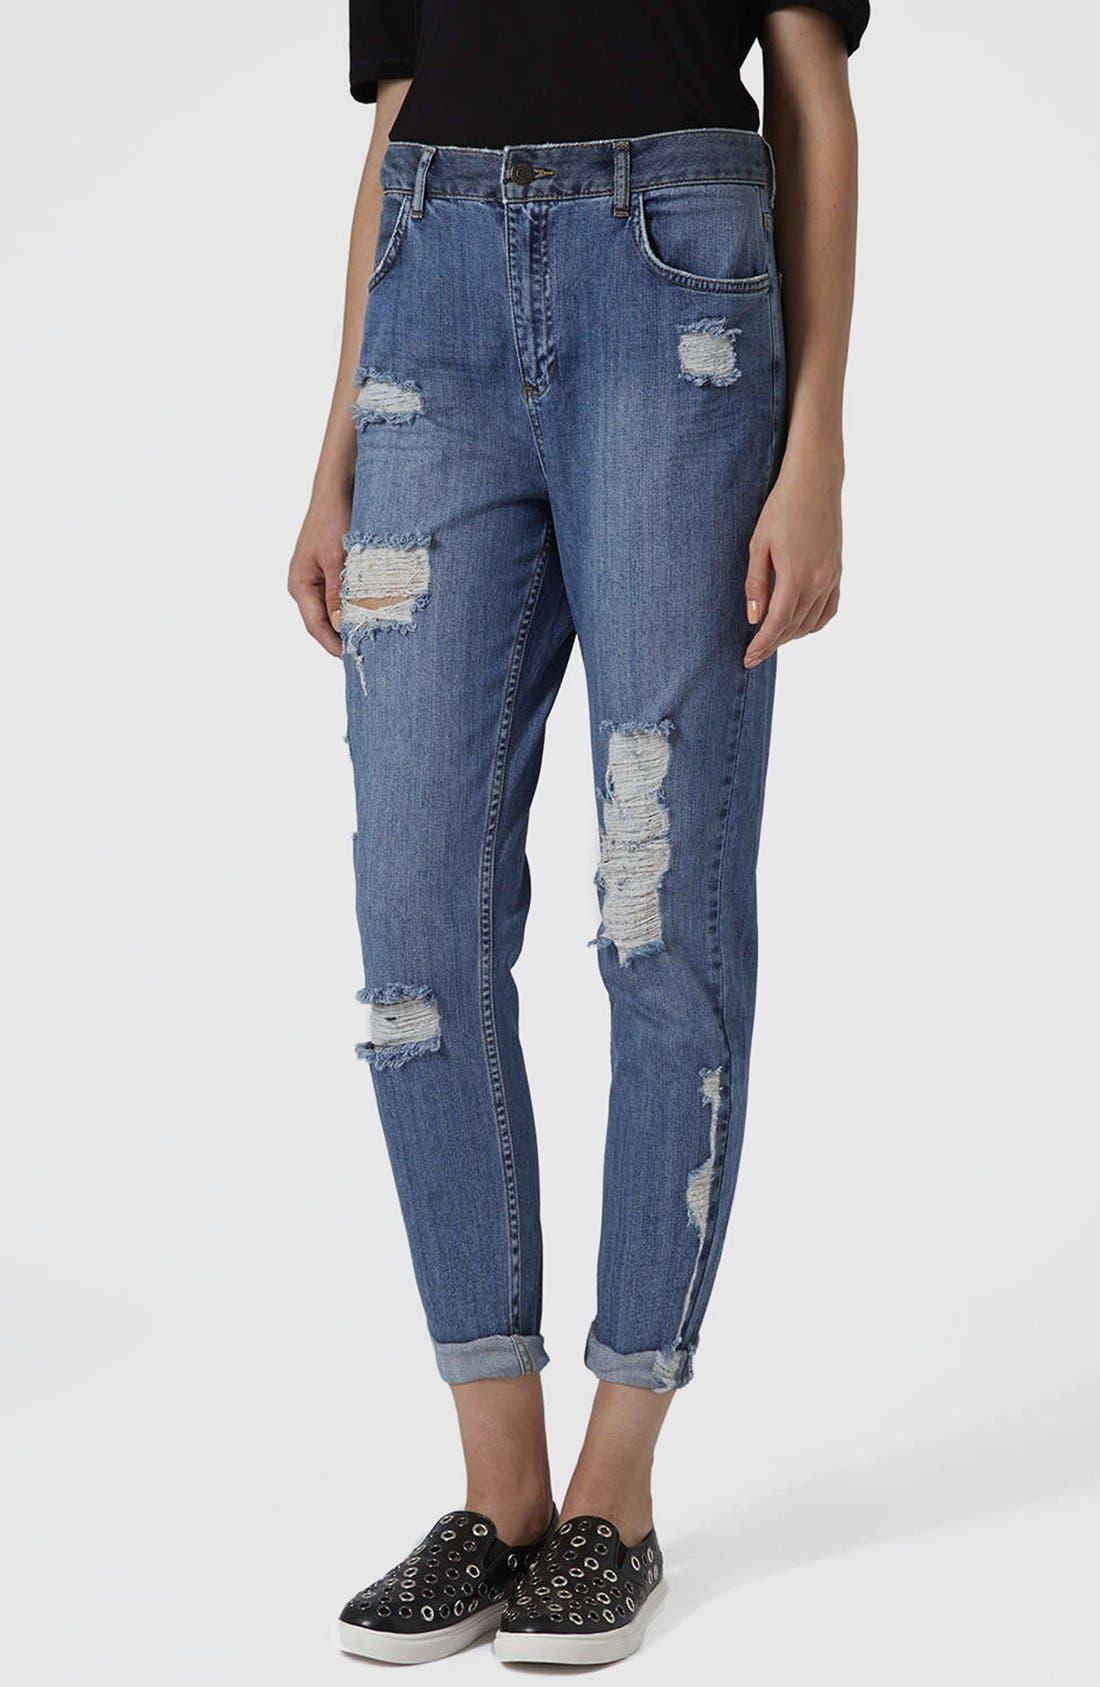 Main Image - Topshop Moto Reclaim To Wear High Waist Tapered Jeans (Mid Denim)